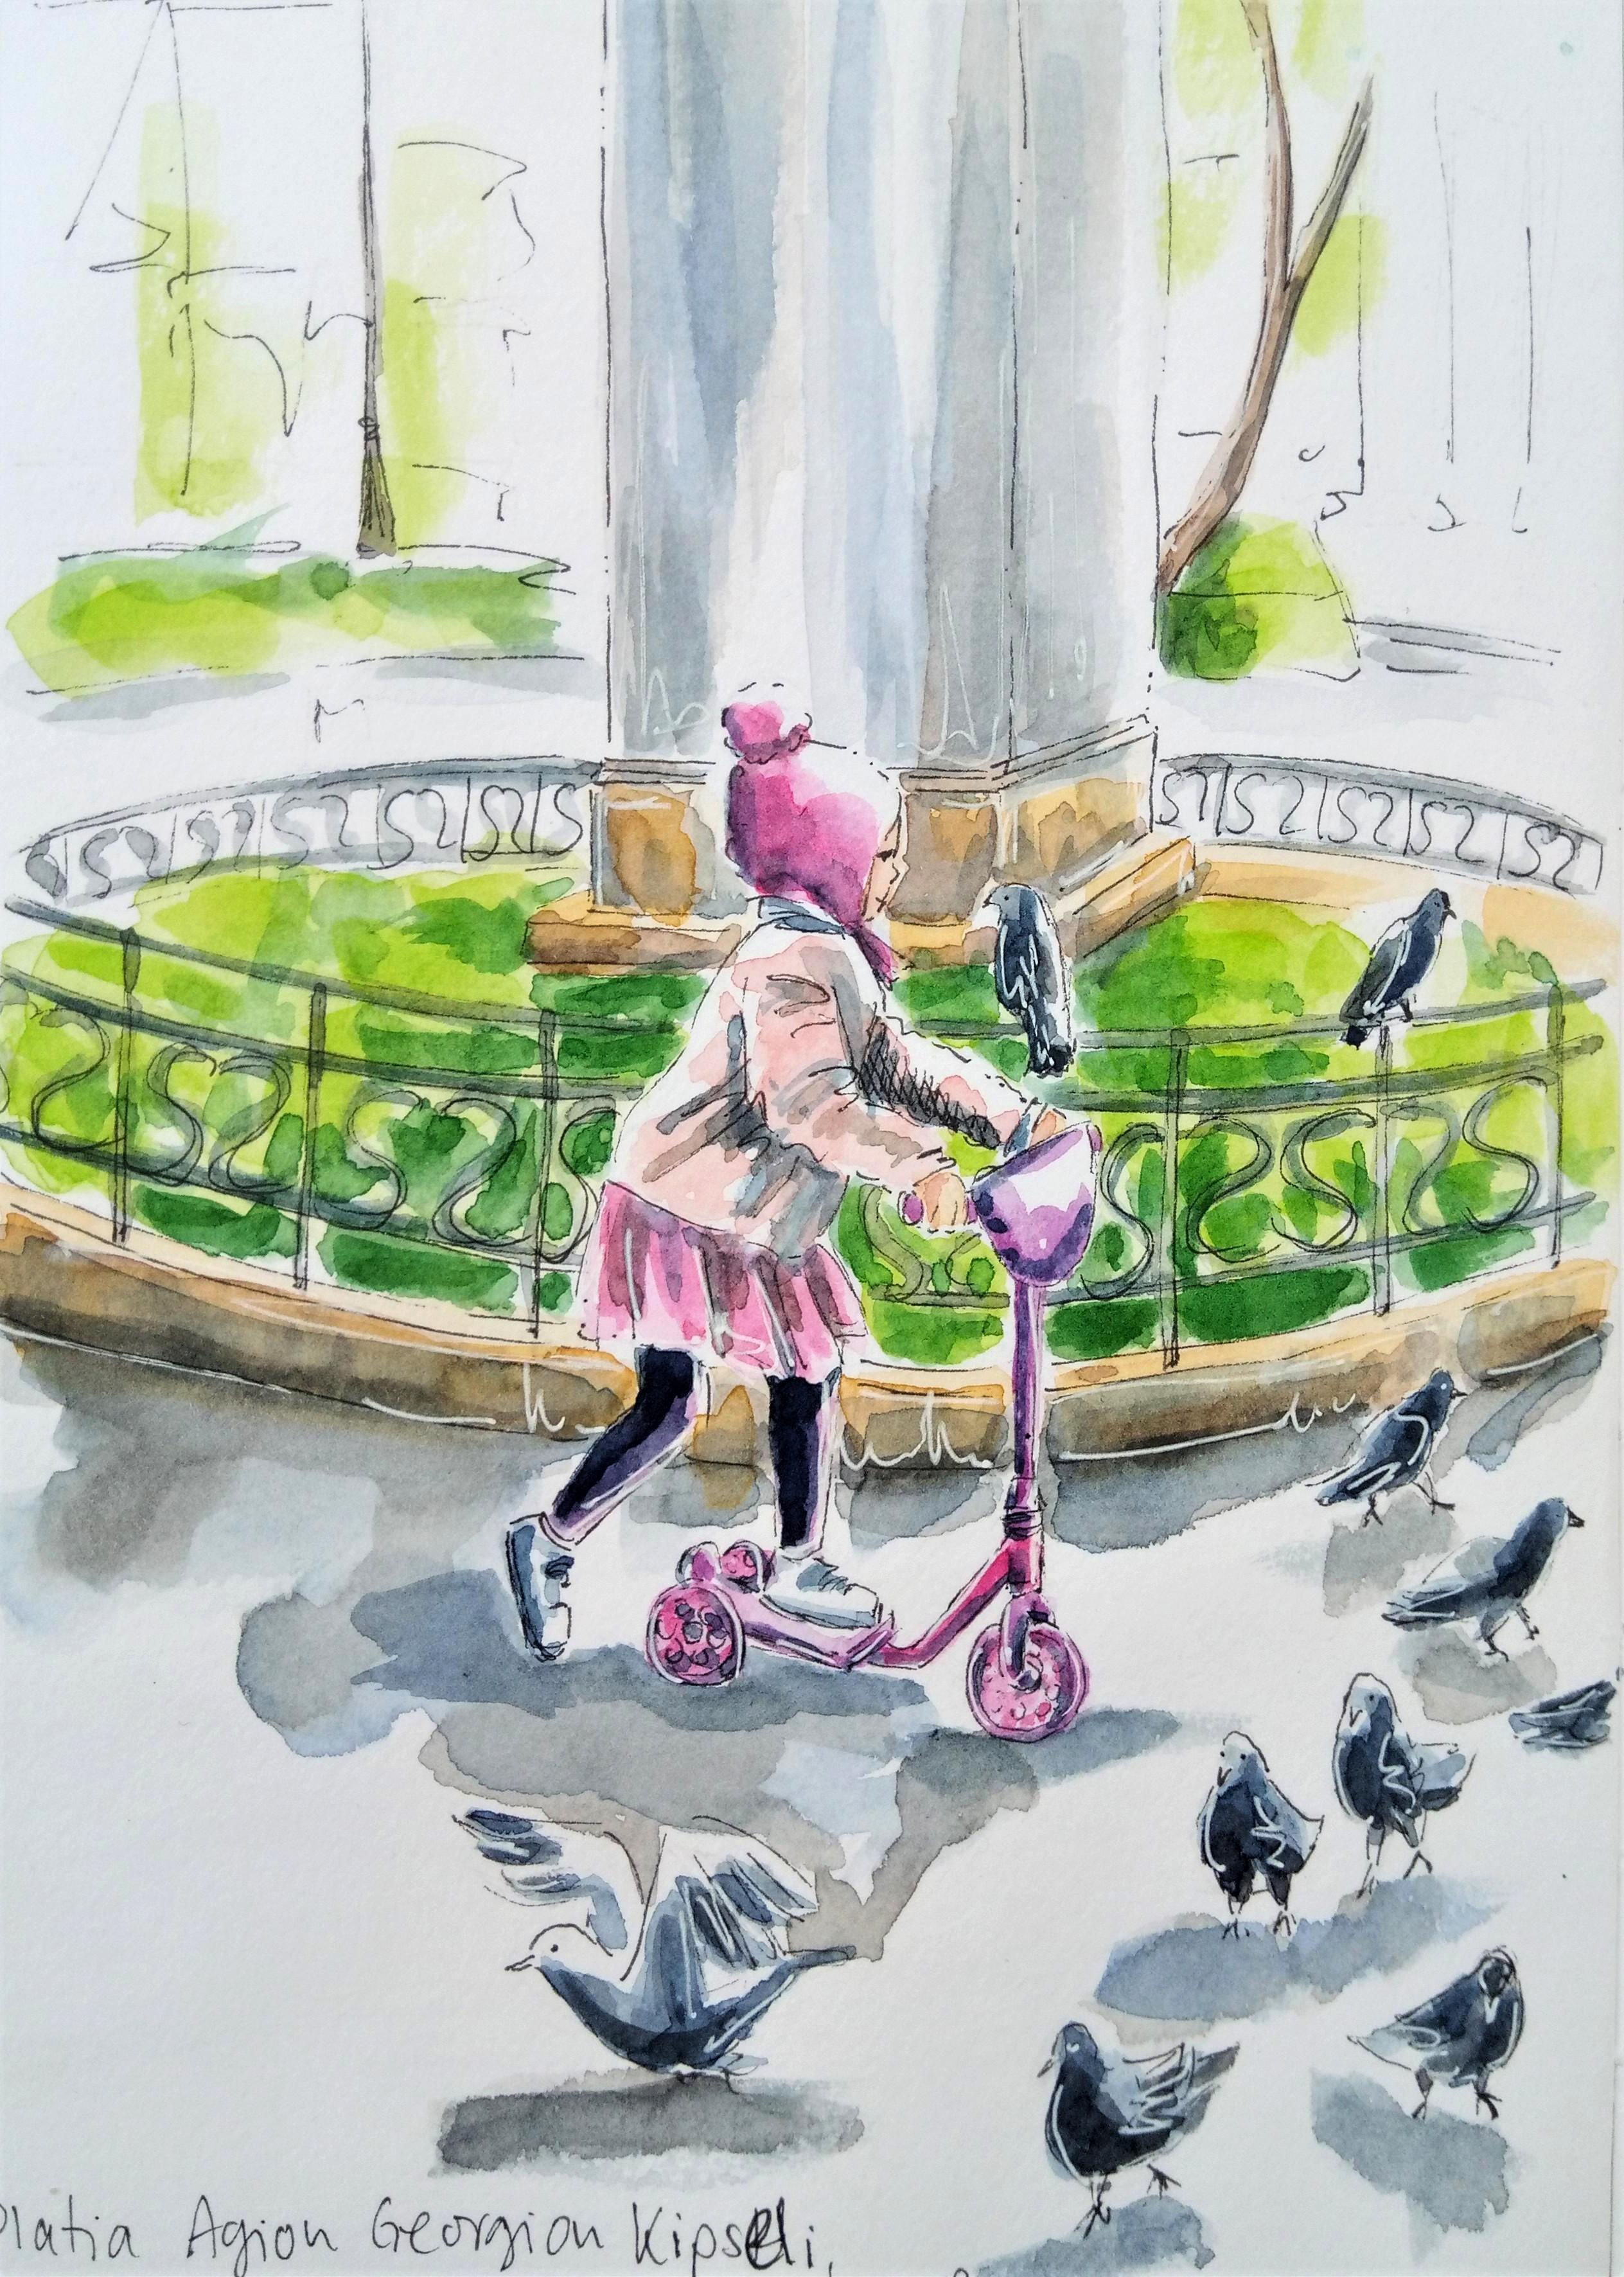 190504 Patia Agiou Square kypseli Athens_Melanie Franz